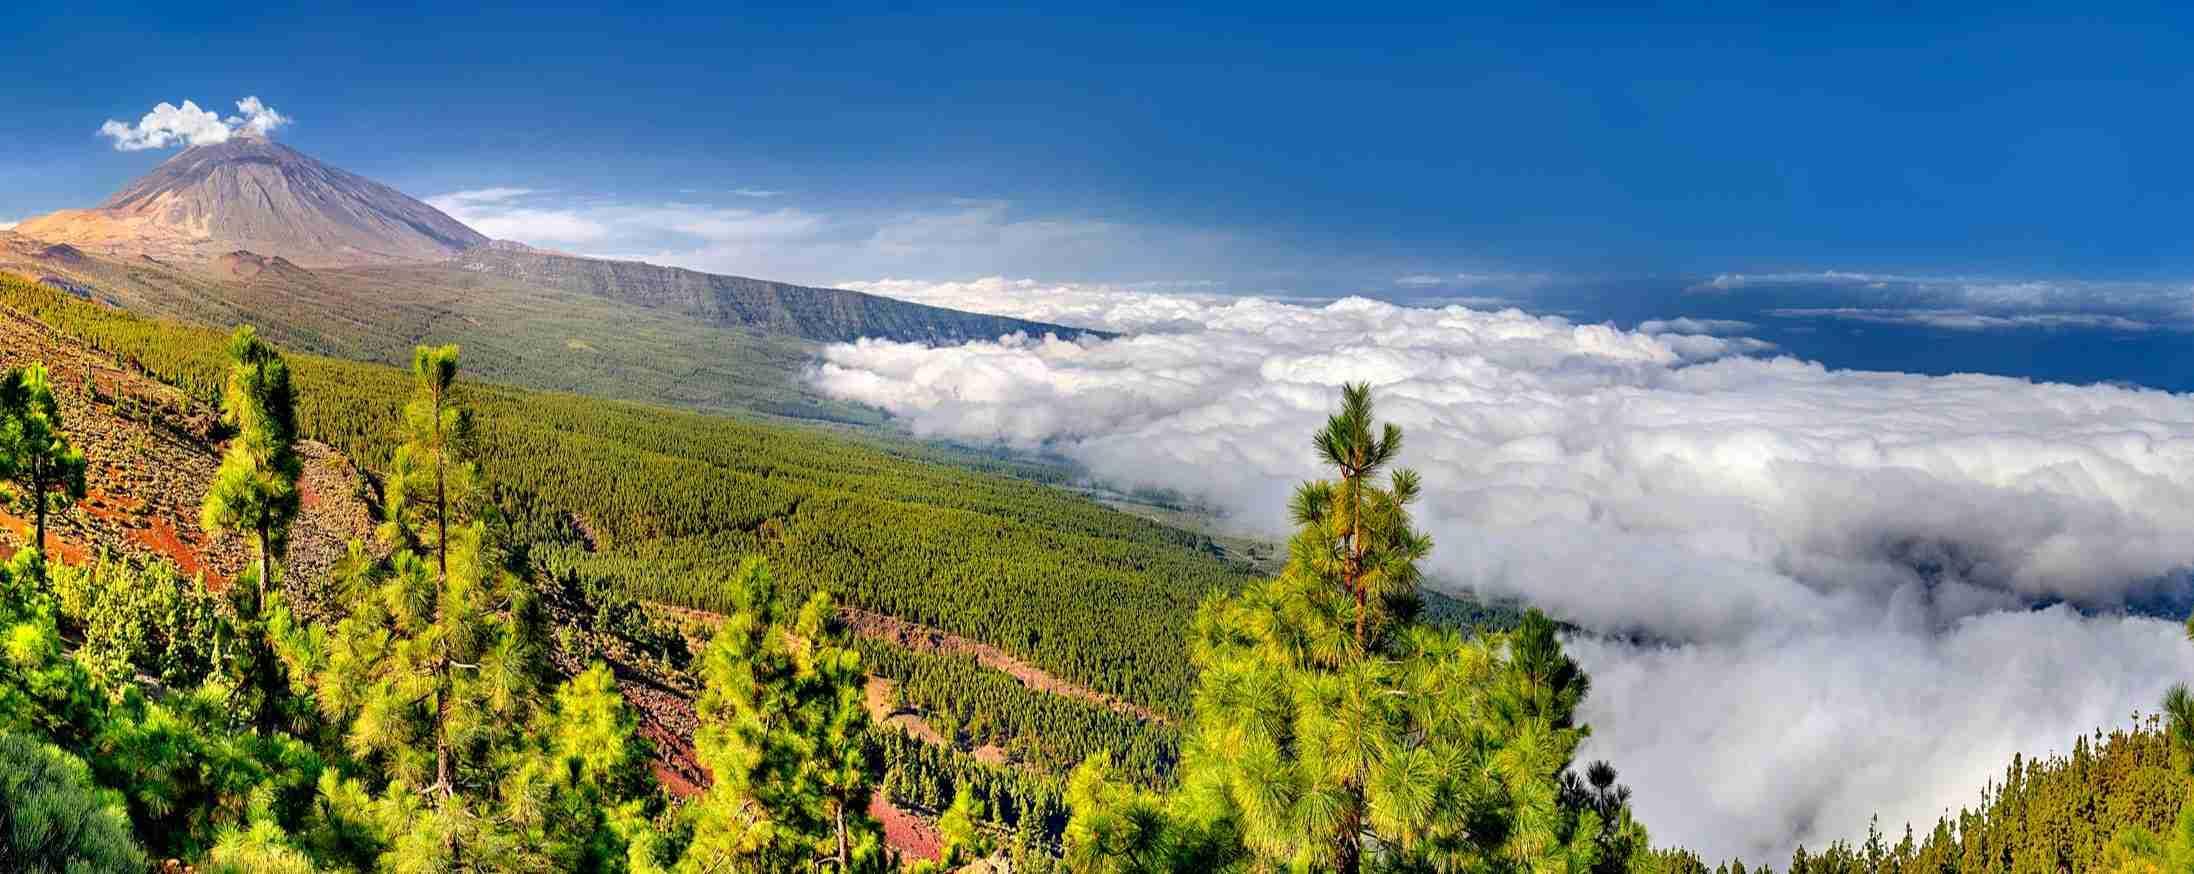 Tenerife and Mount Teide Short Break